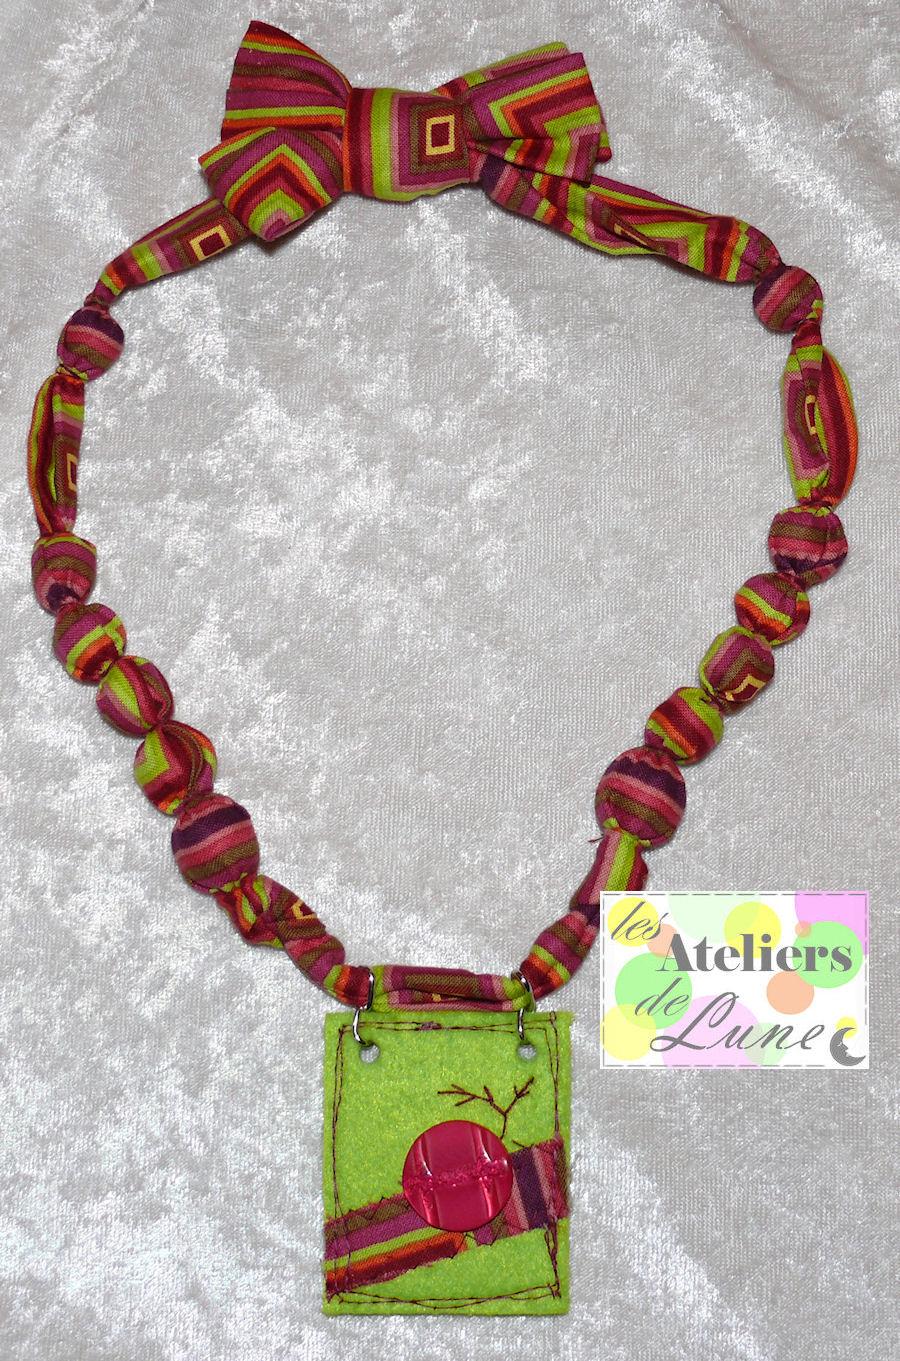 http://scrap.en.folie.free.fr/apourblog/bijoux/2010/perle_tissu/vert/collier/2%20rectanglevertpomme/Image3.jpg